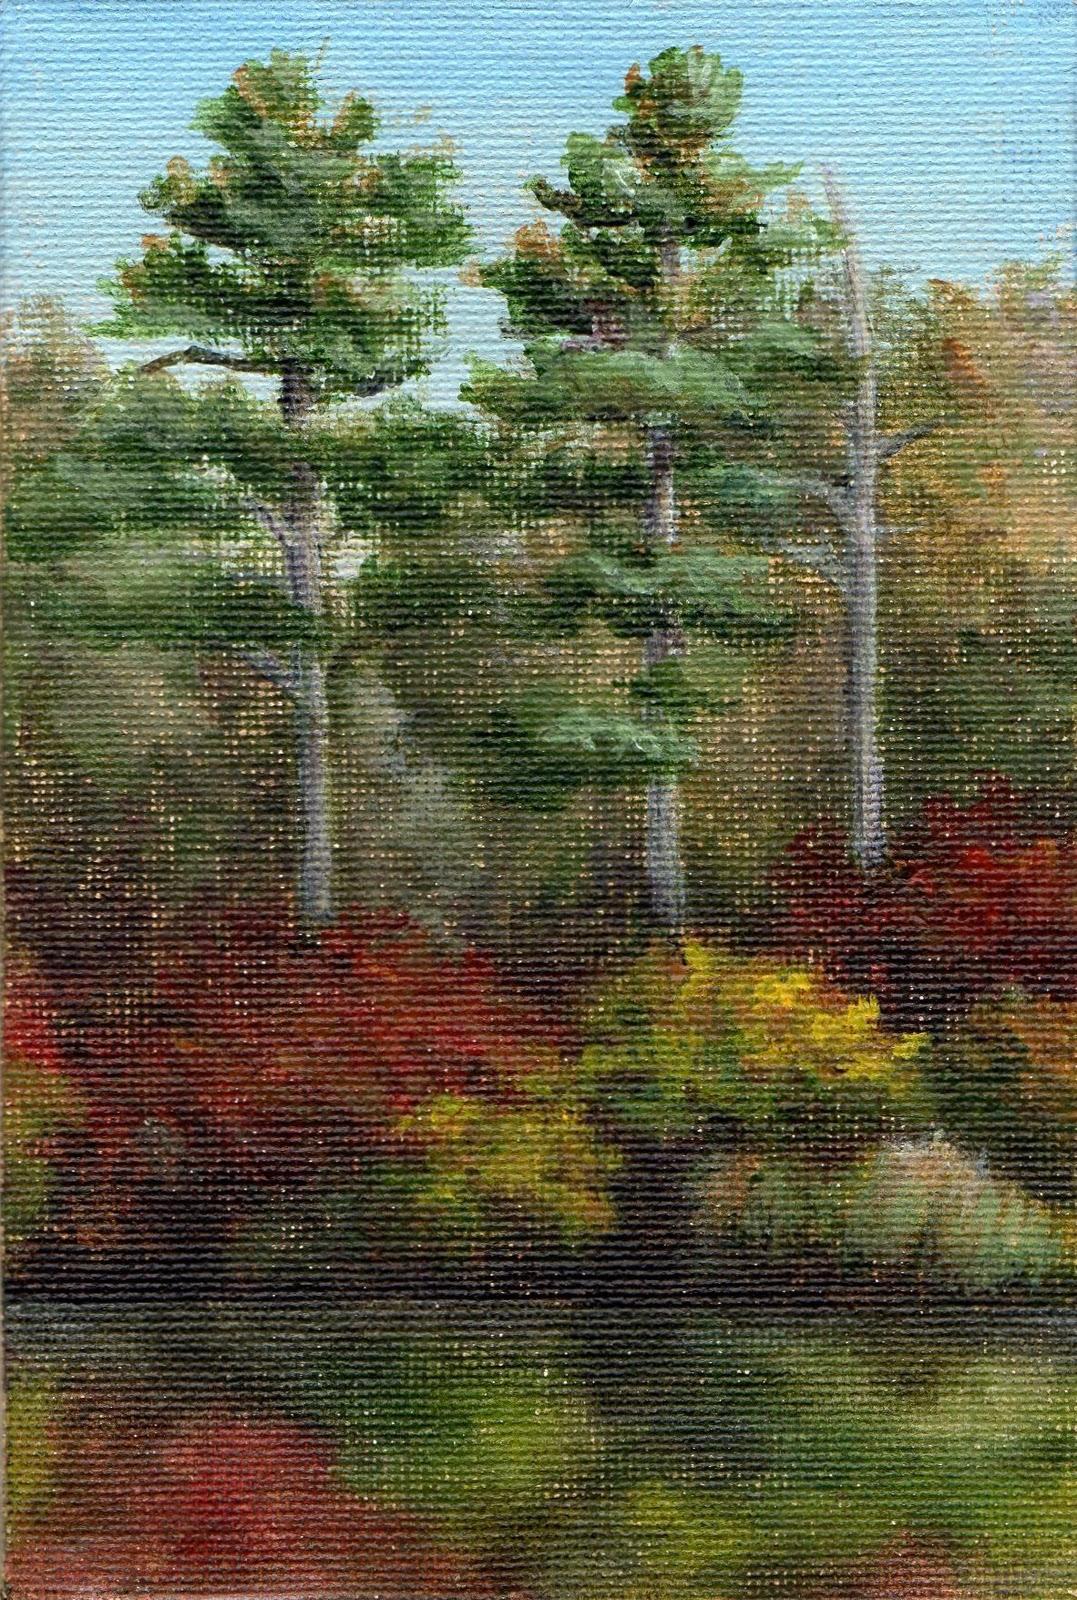 """Mary Herrick Forest Pond"" original fine art by Debbie Shirley"